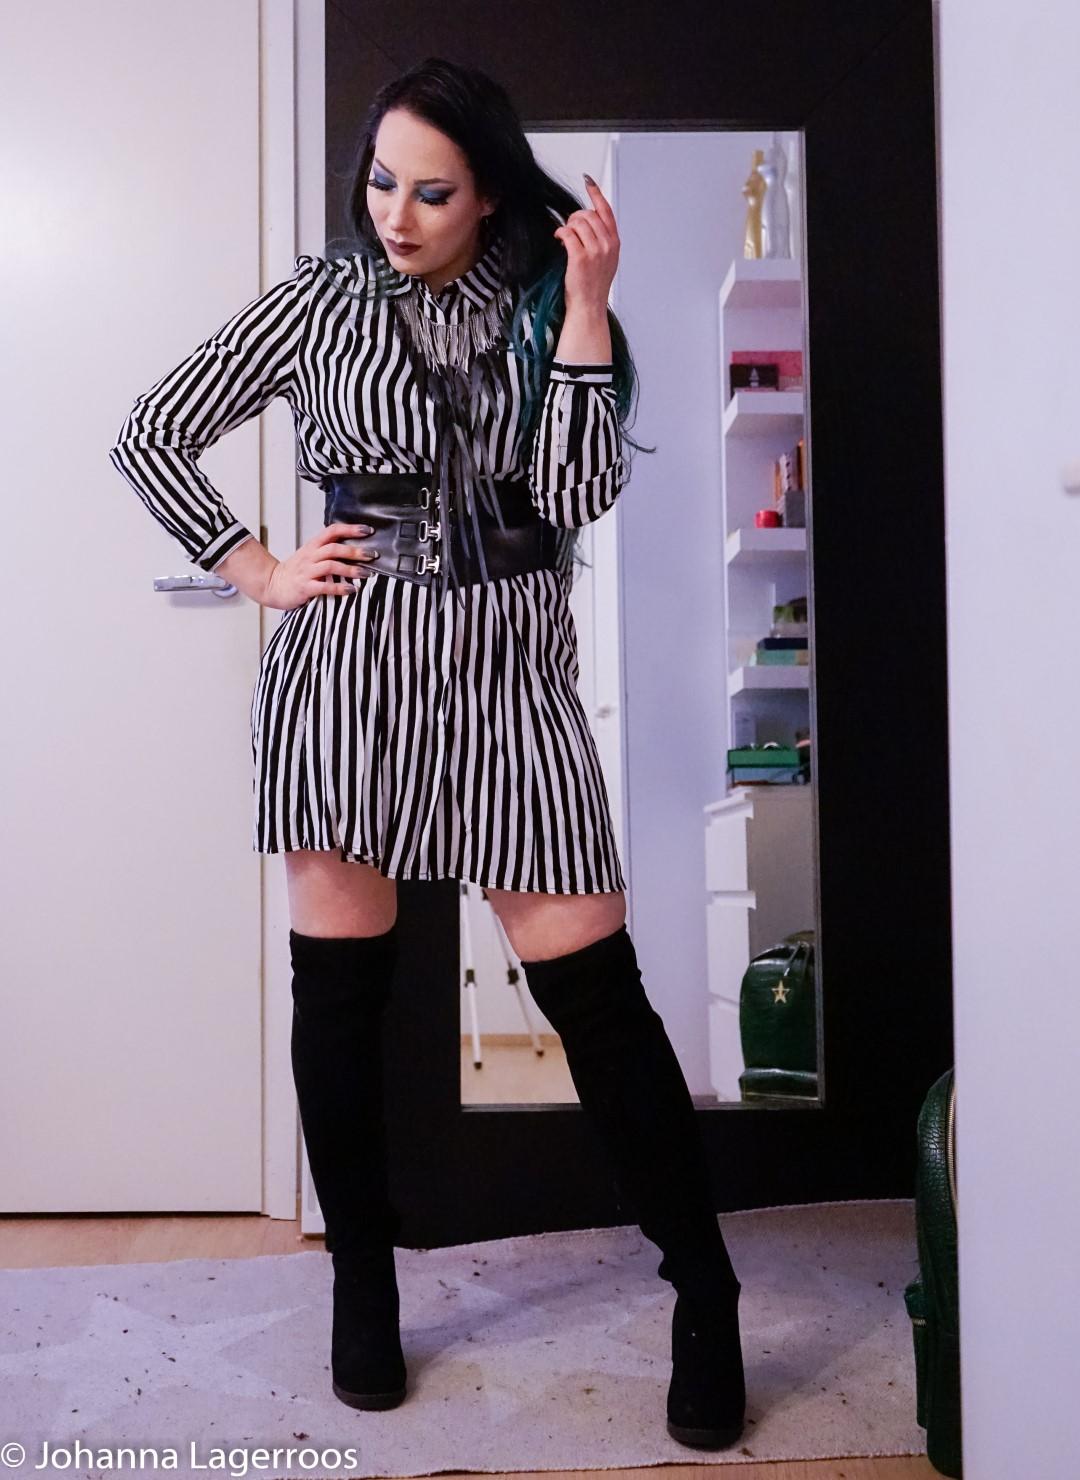 bold stripes look